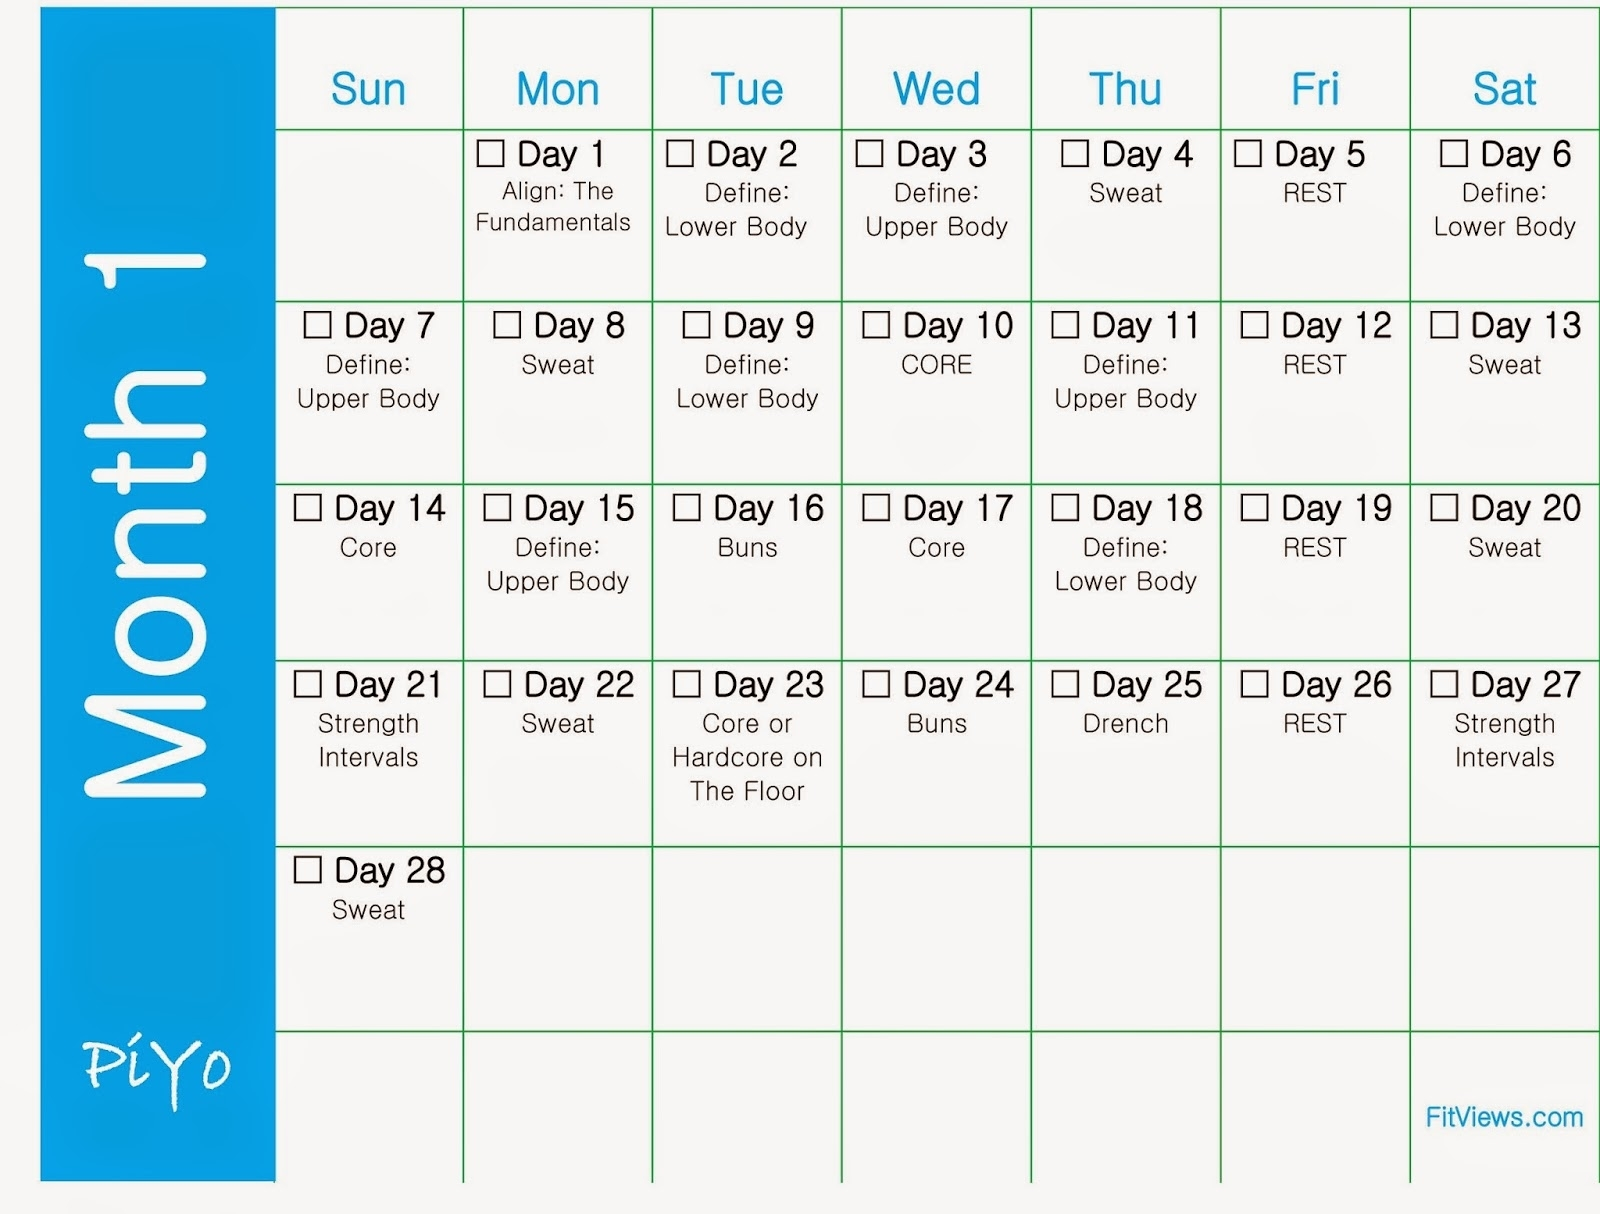 Getting Started With Piyo + Free Printable Piyo Workout Calendars